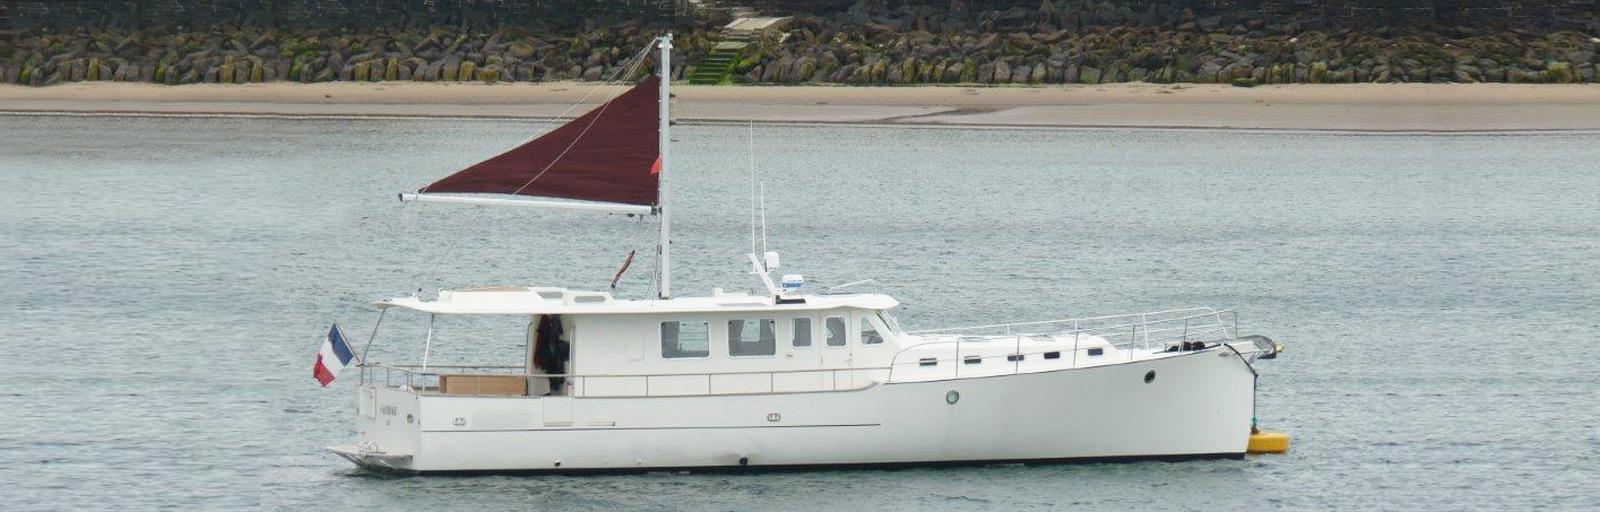 MY16 Trawler - AYC Yachtbrokers